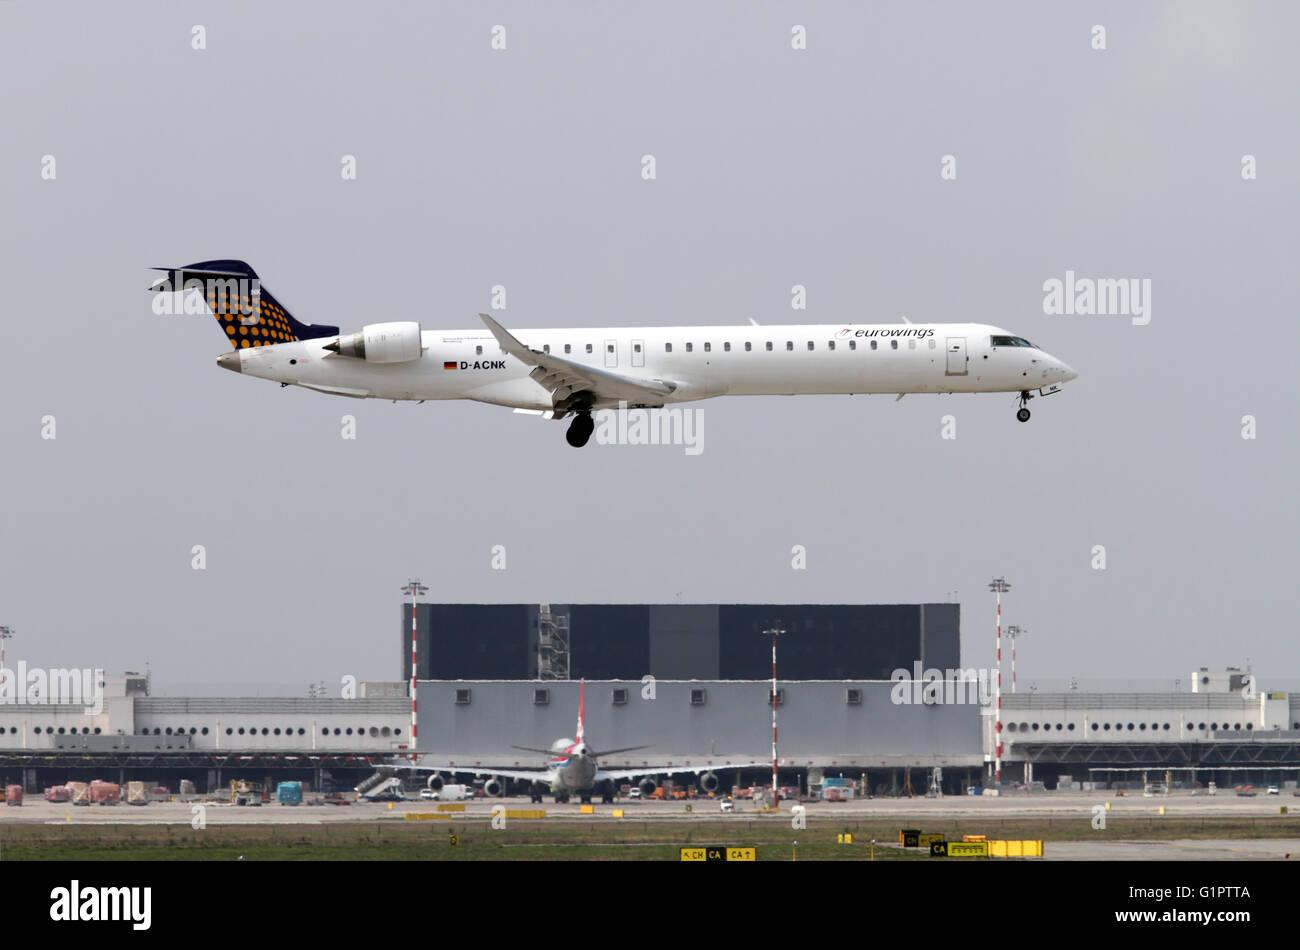 Eurowings, Canadair CRJ-900 Photographed at Malpensa airport, Milan, Italy - Stock Image